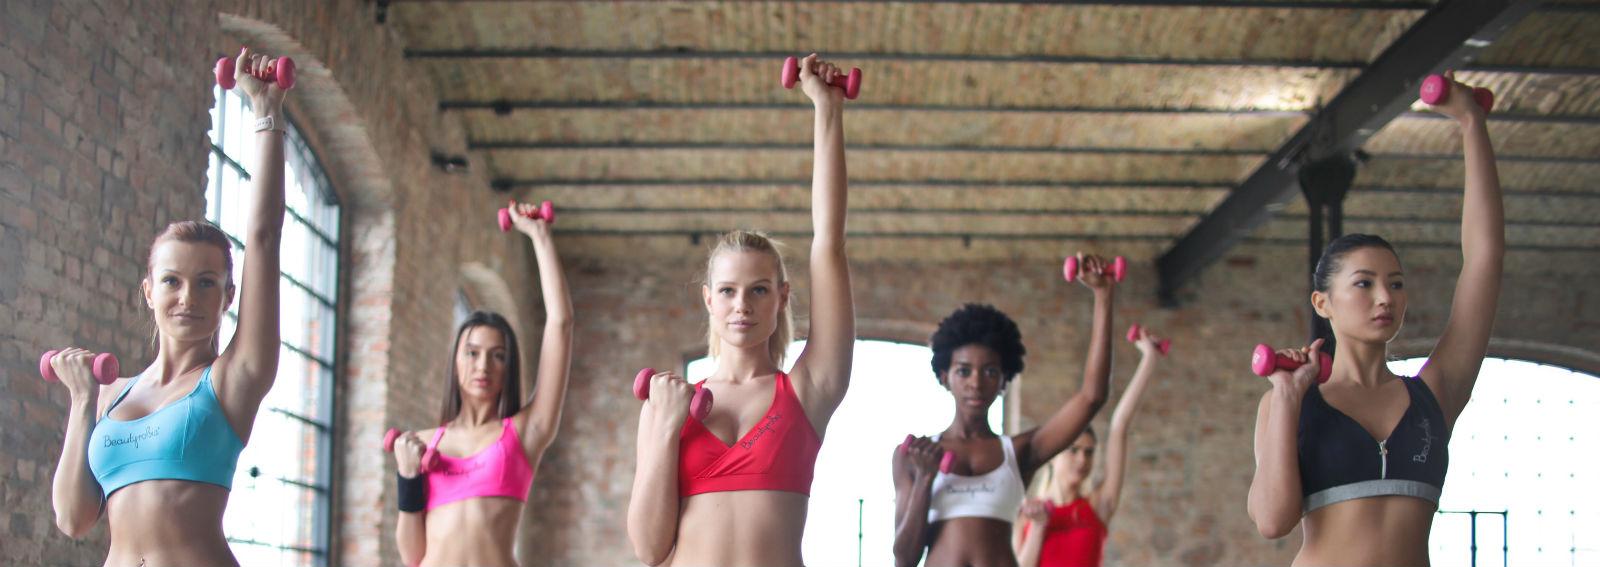 fitness classe donna (desktop)